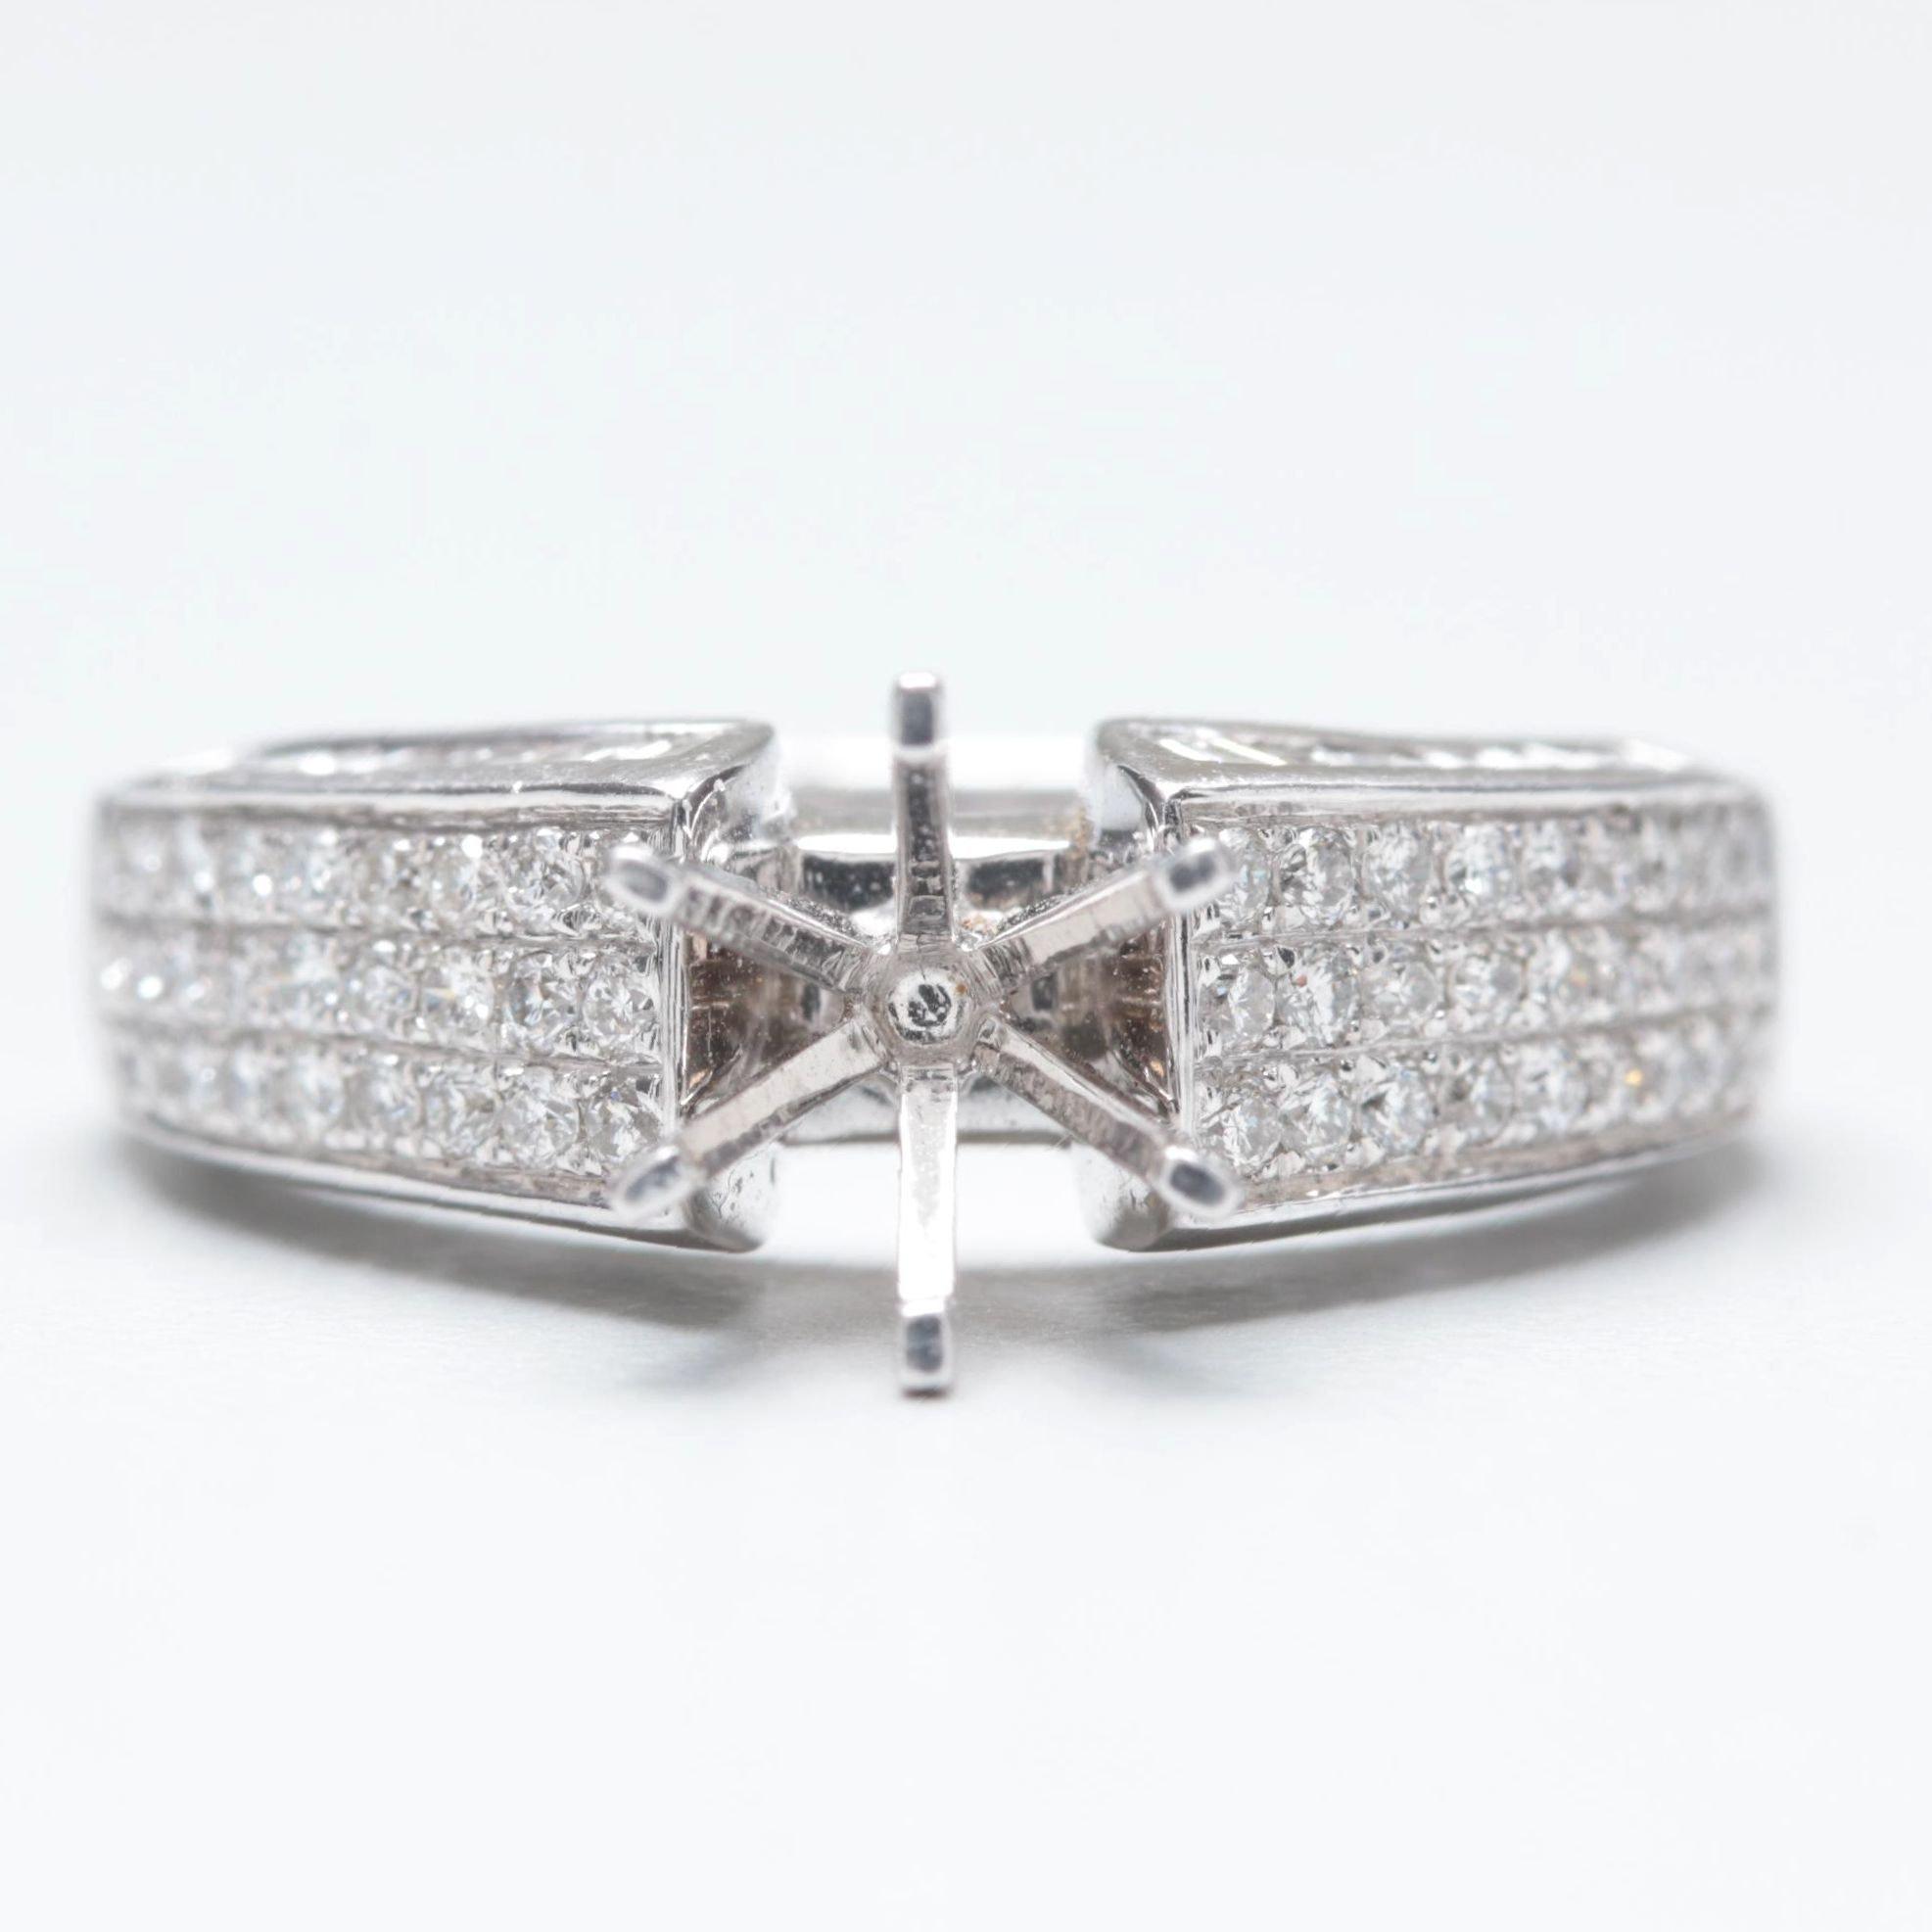 14K White Gold 0.98 CTW Diamond Semi-Mount Ring